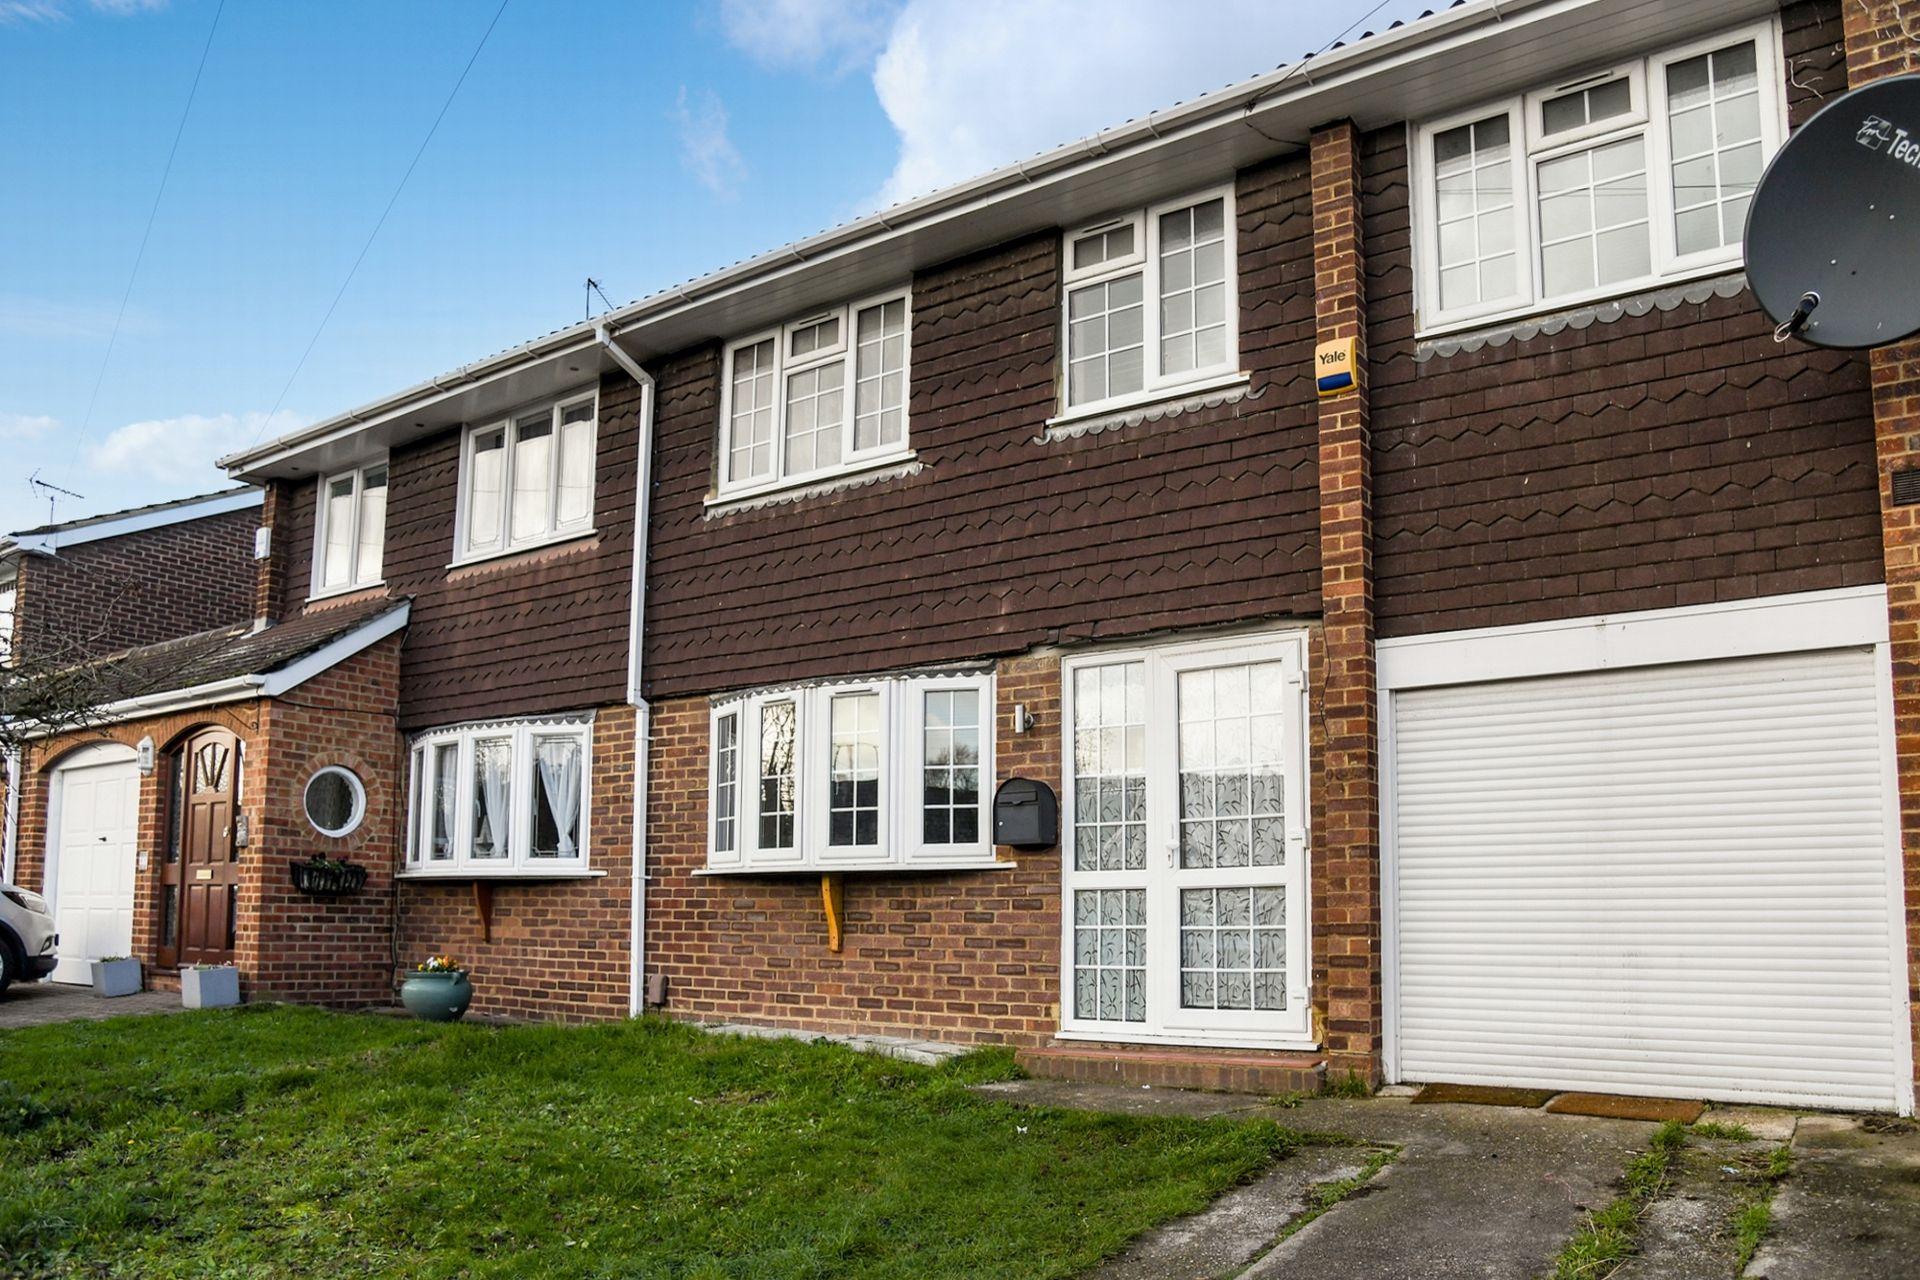 Property photo 1 of 18. External